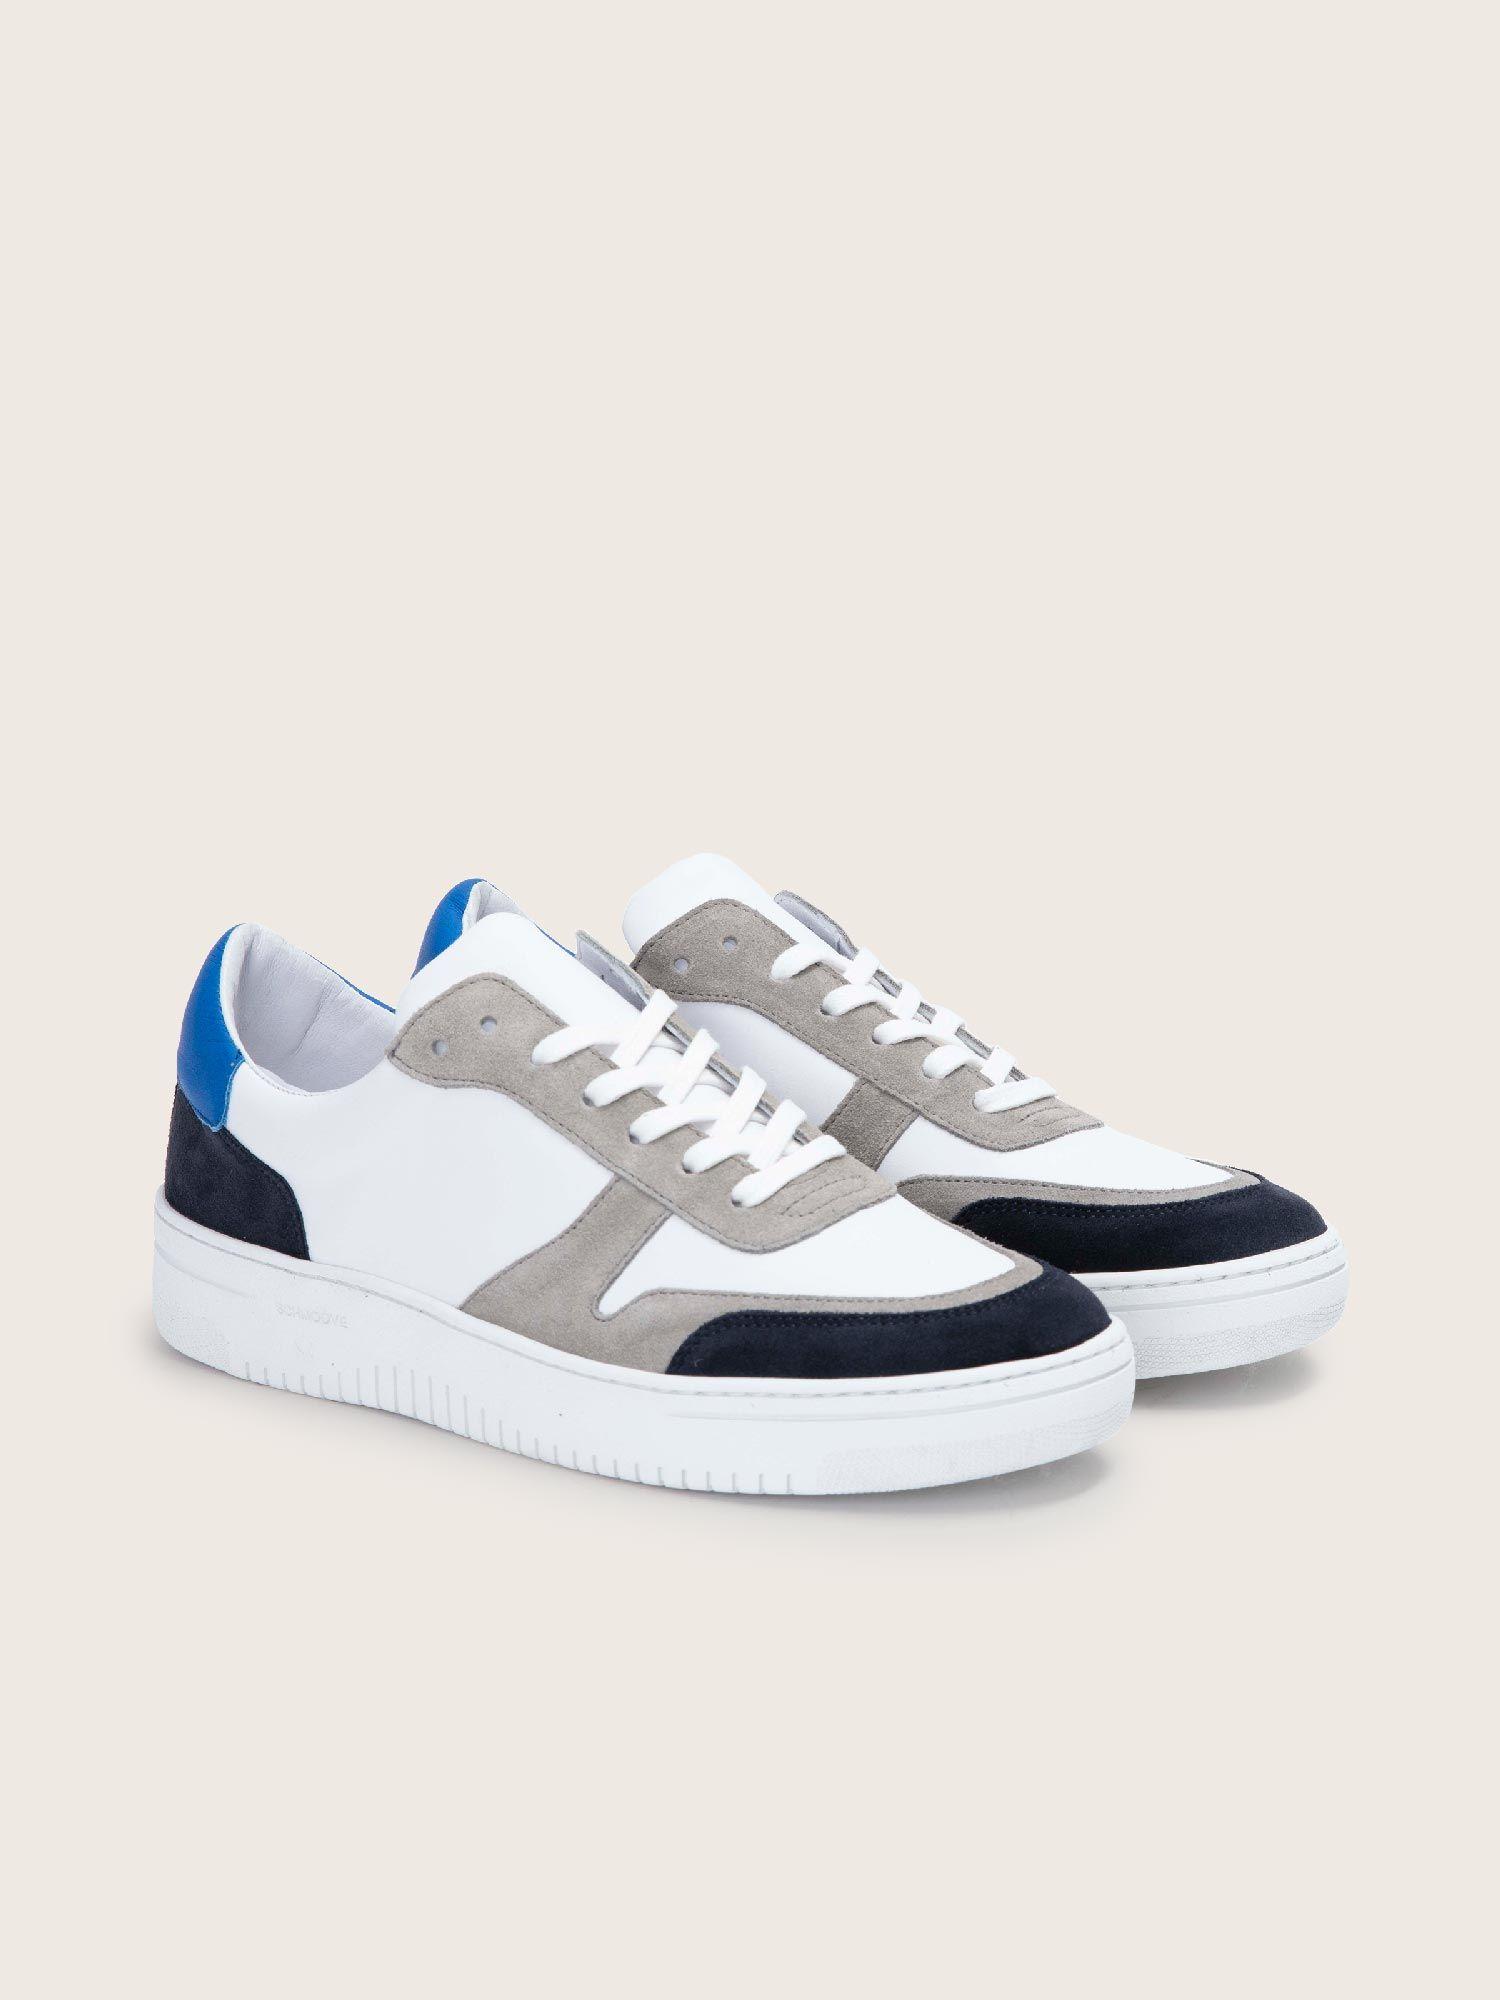 schmoove.fr EVOC SNEAKER - SUEDE/NAPPA - NIGHT BLUE/WHITE